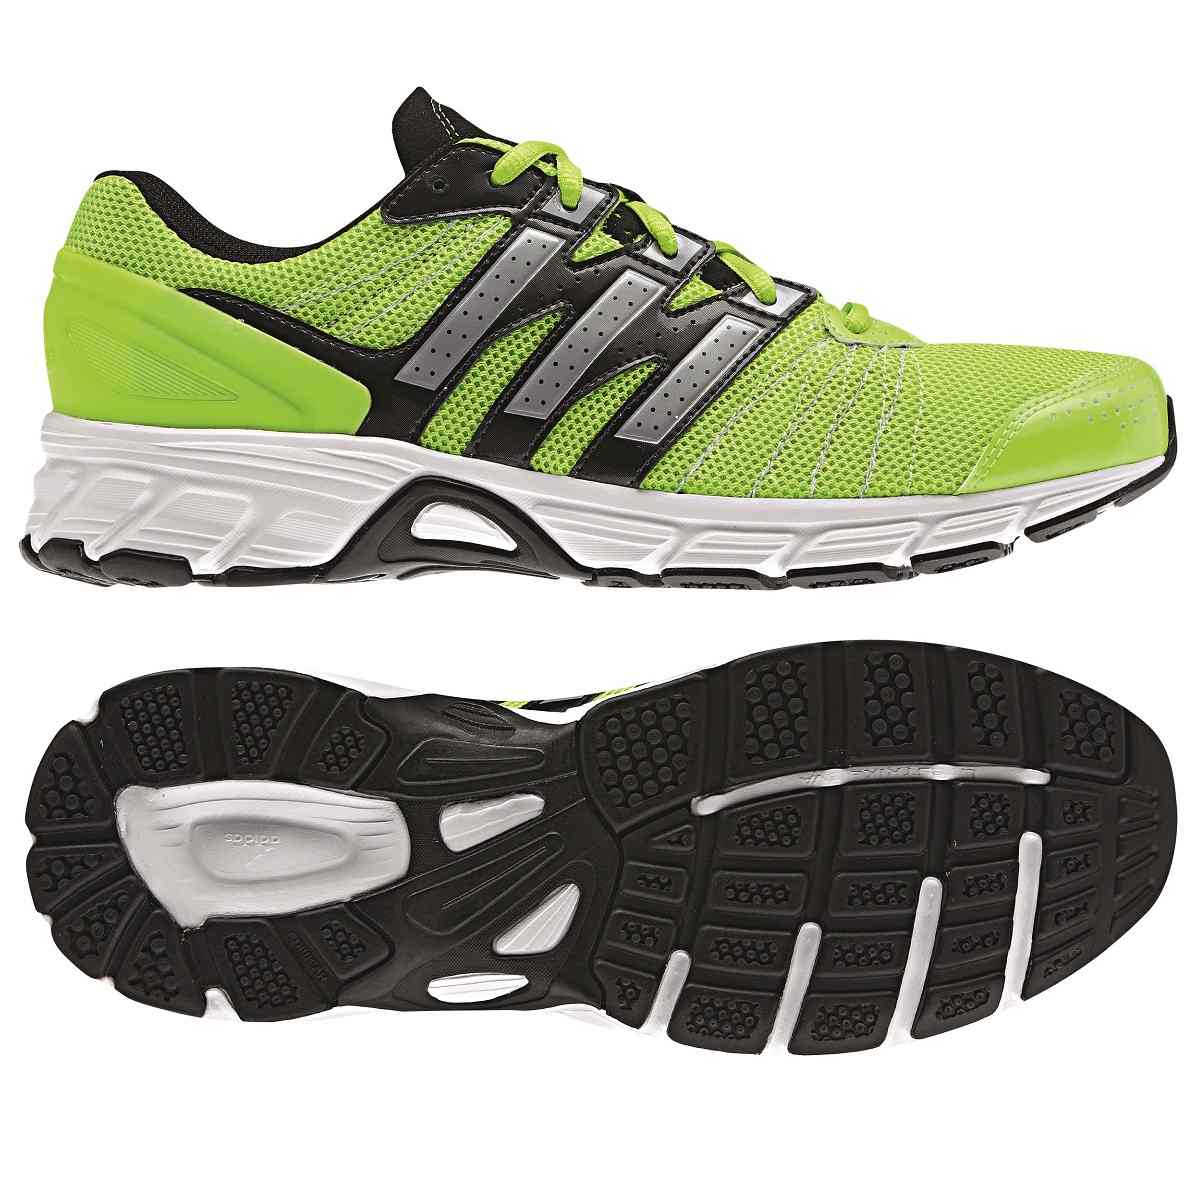 adidas roadmace m schuhe laufschuhe joggingschuhe. Black Bedroom Furniture Sets. Home Design Ideas